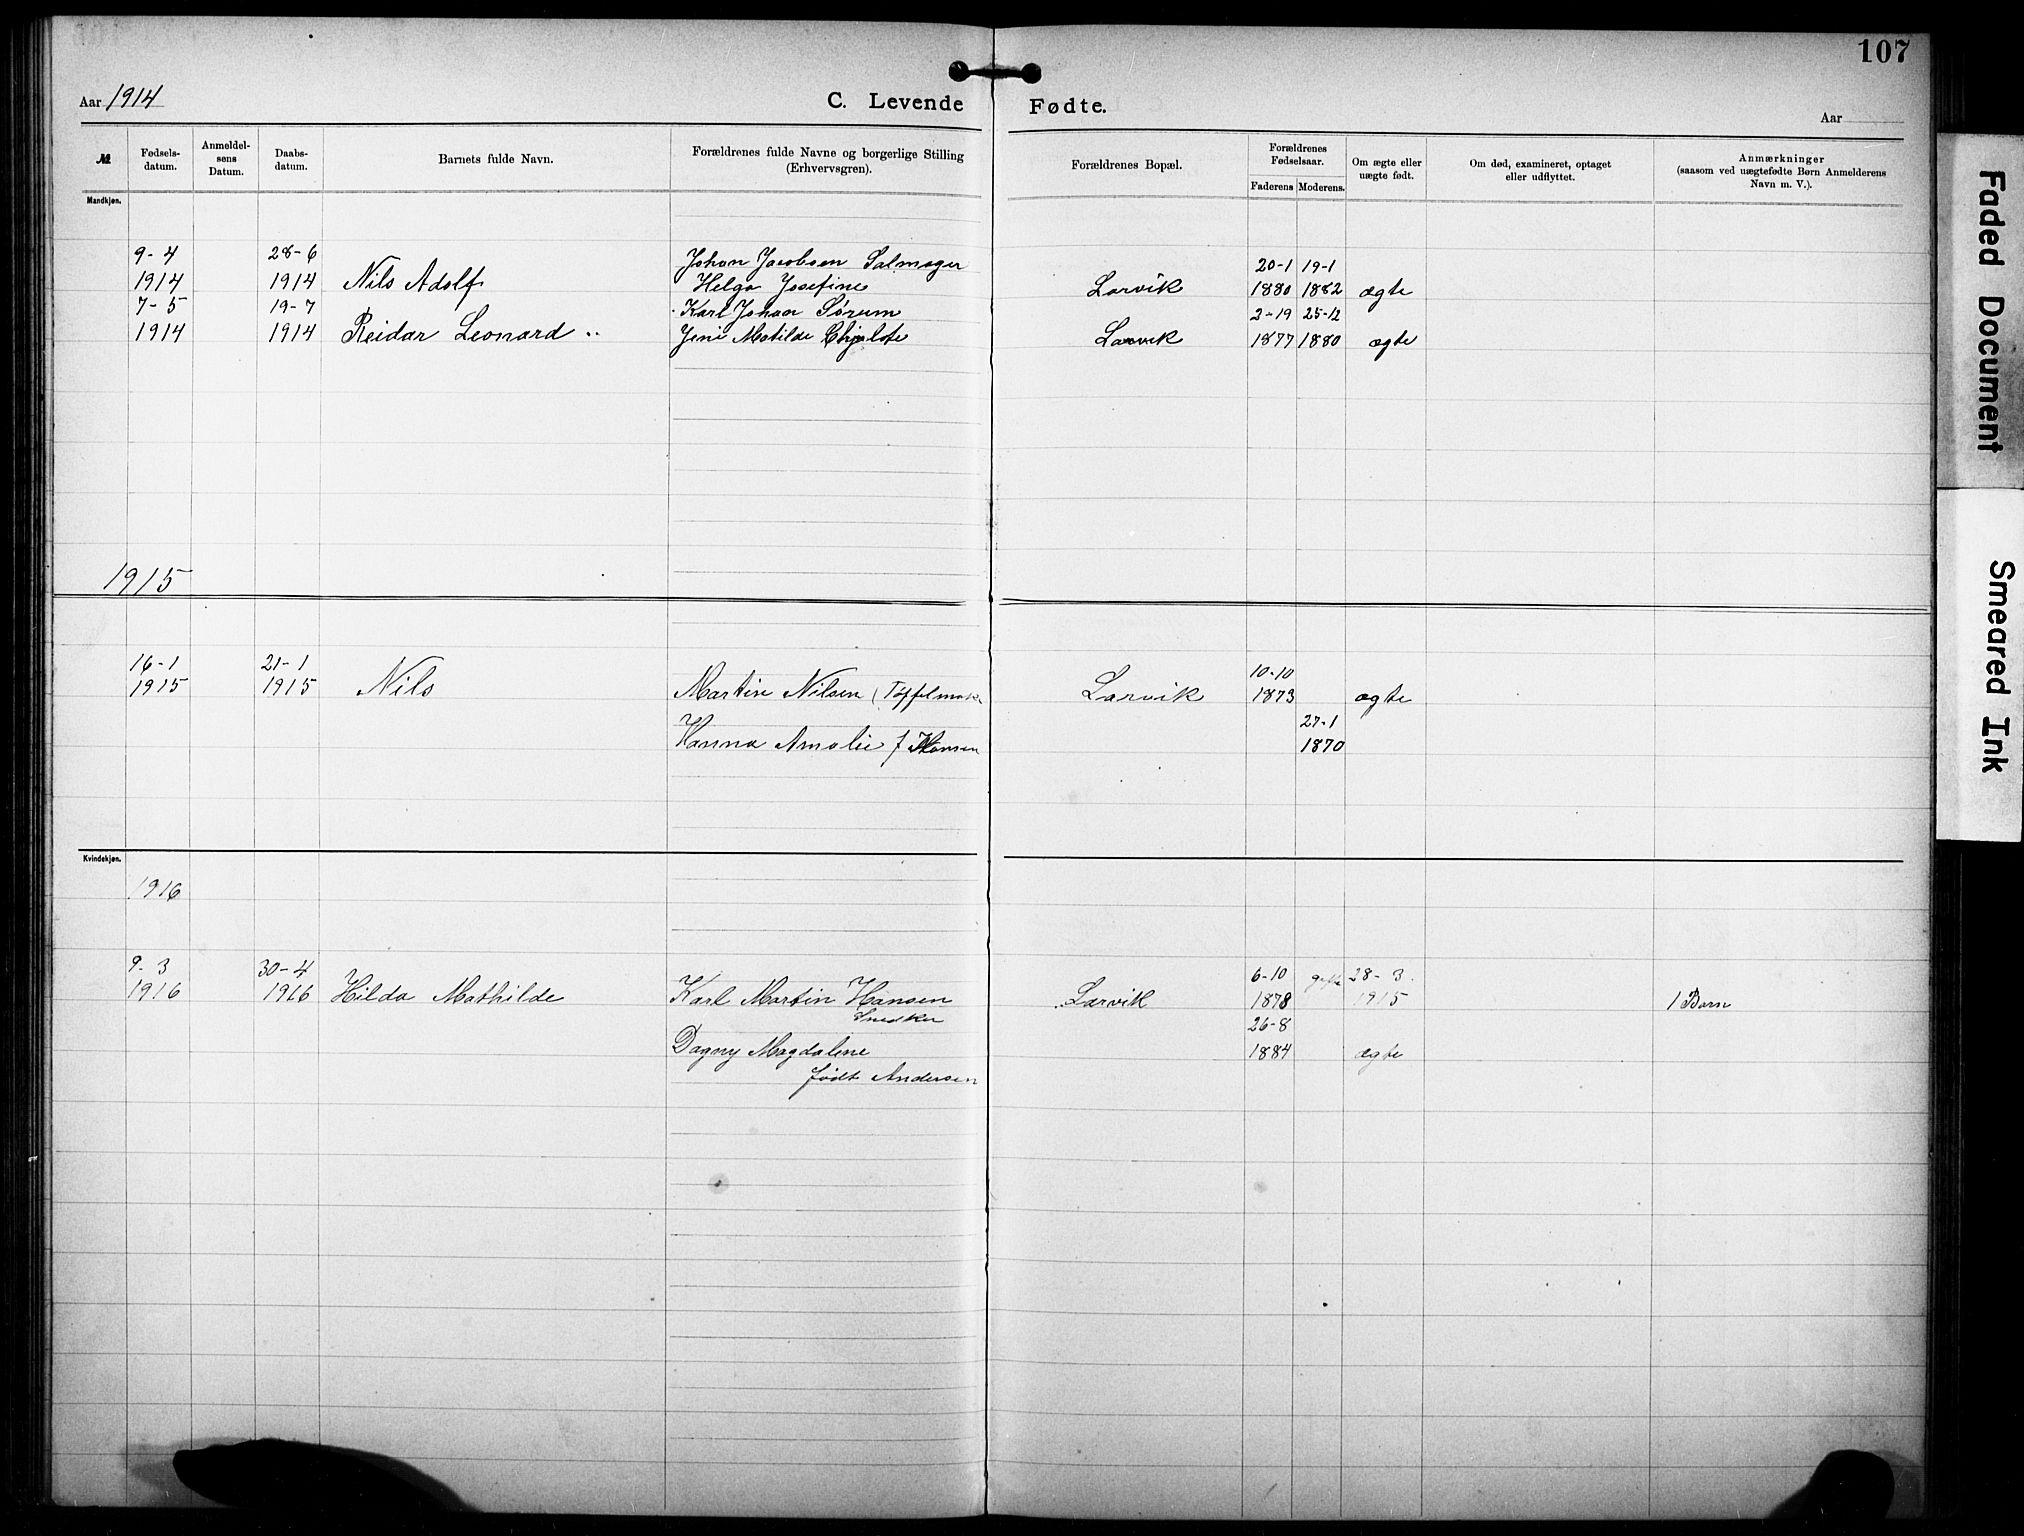 SAKO, Den katolsk-apostoliske menighet i Larvik, F/Fa/L0001: Dissenter register no. 1, 1892-1933, p. 107